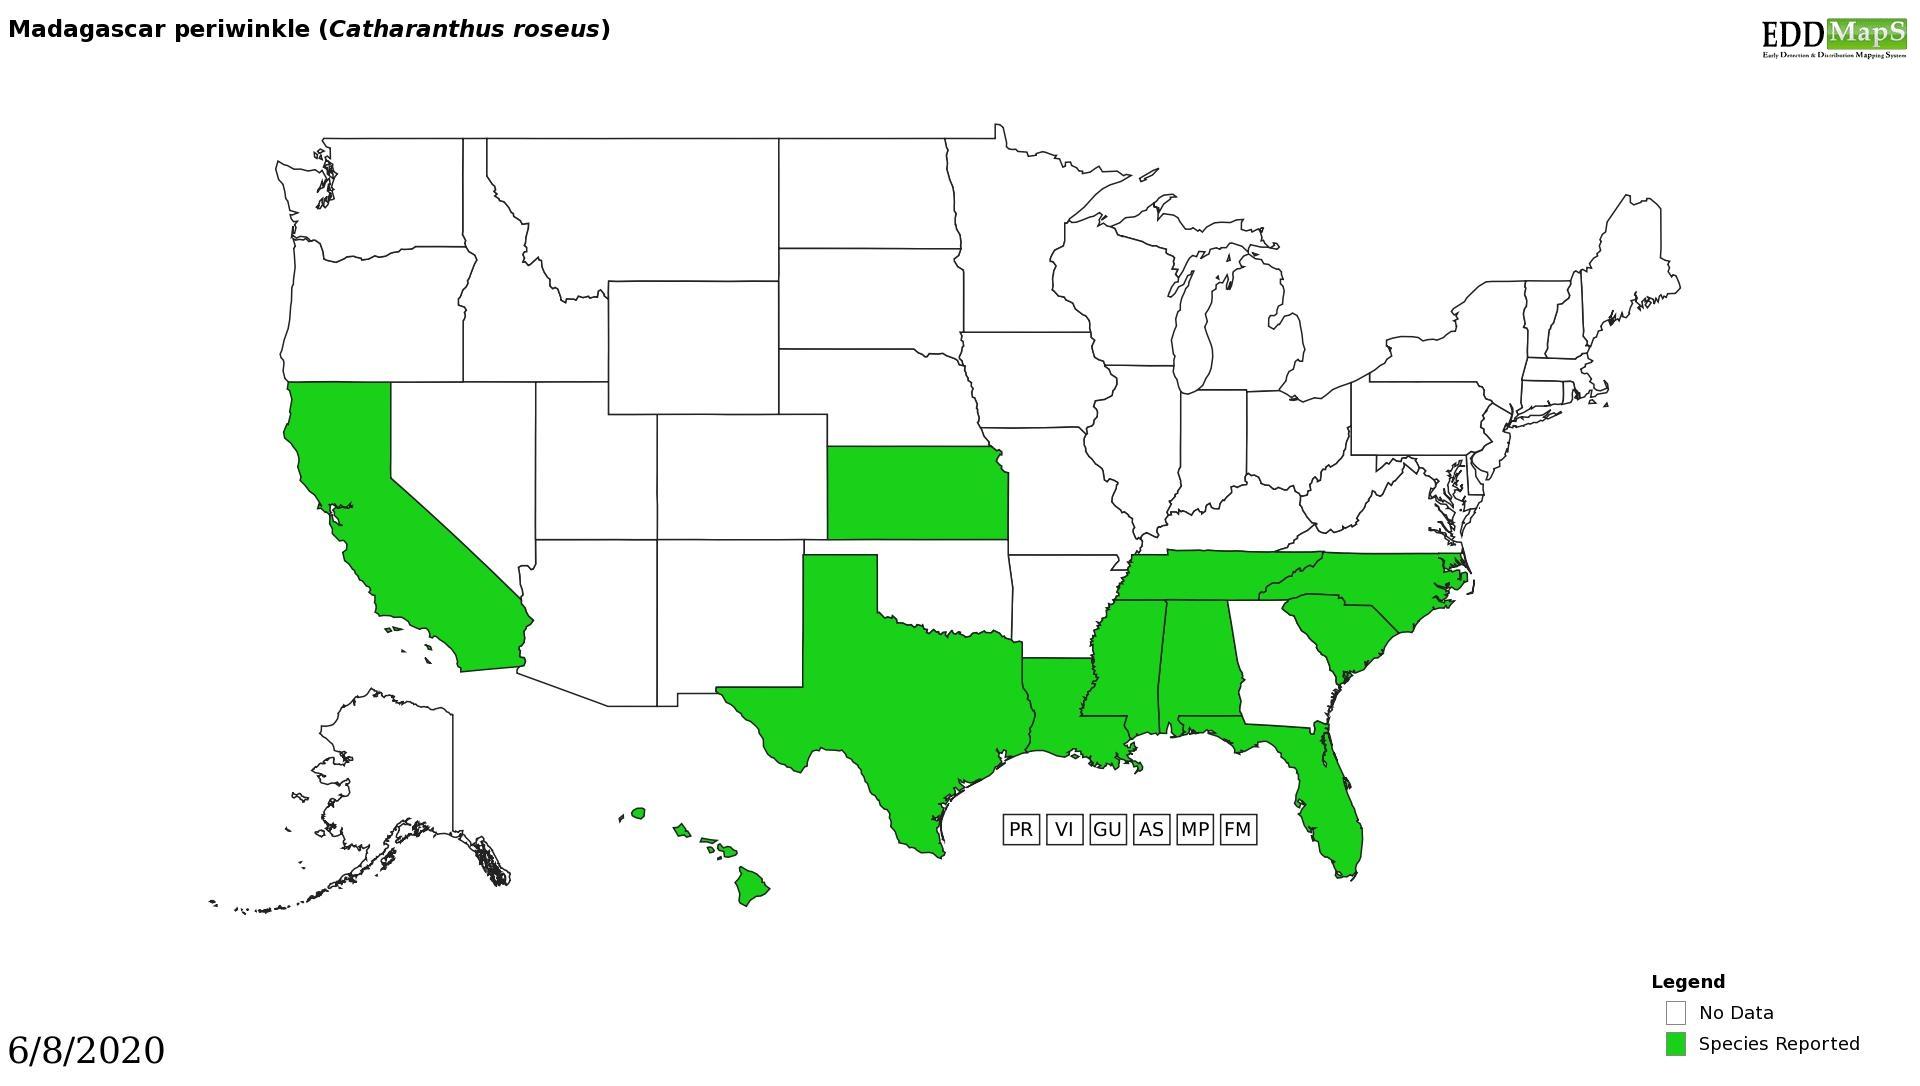 Madagascar periwinkle  distribution - United States